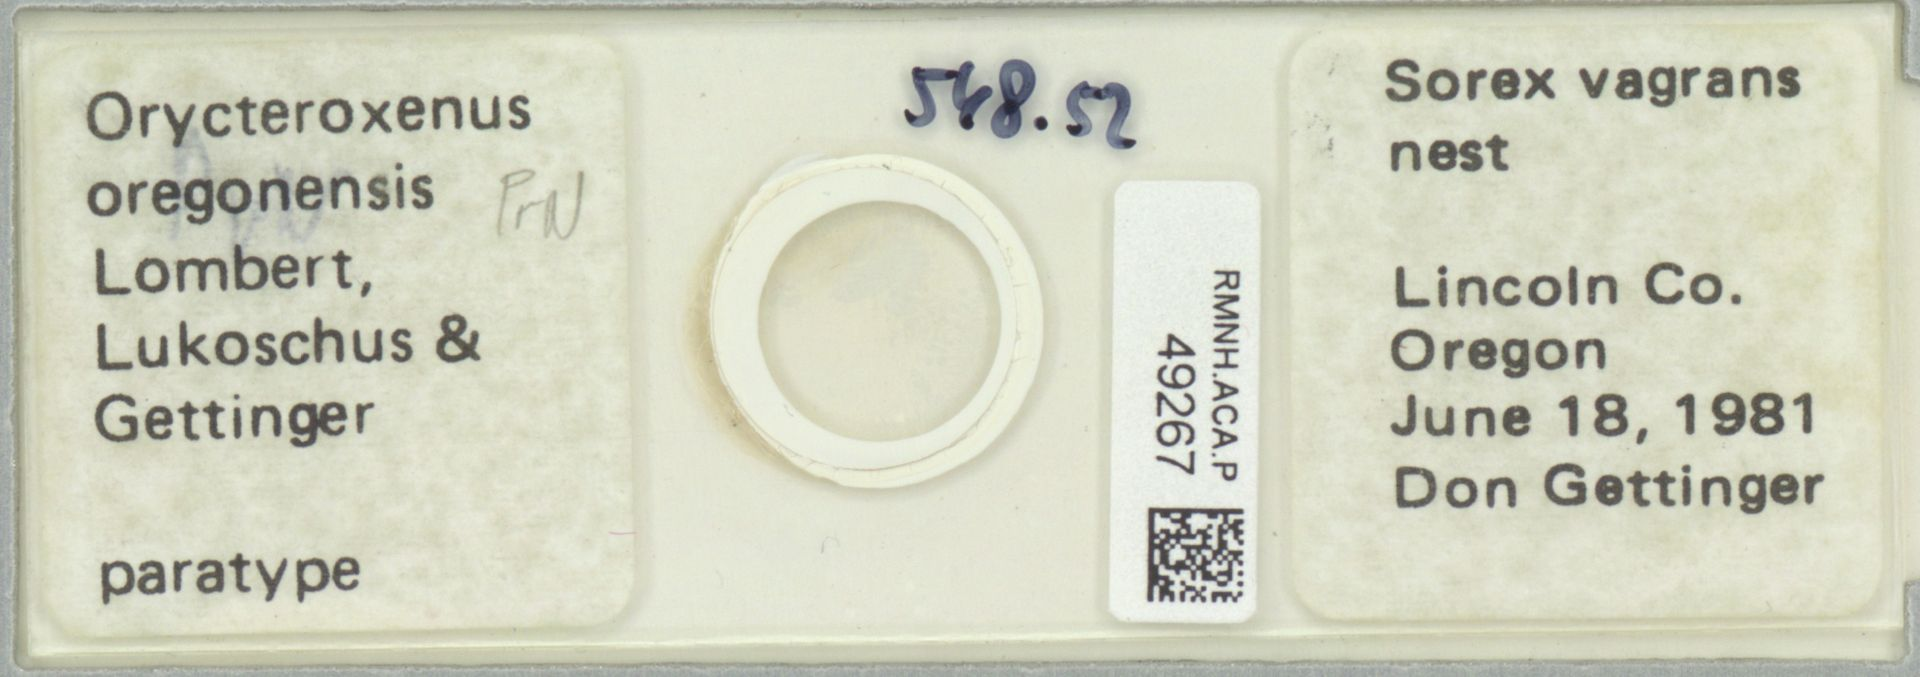 RMNH.ACA.P.49267 | Orycteroxenus oregonensis Lombert, Lukoschus & Gettinger